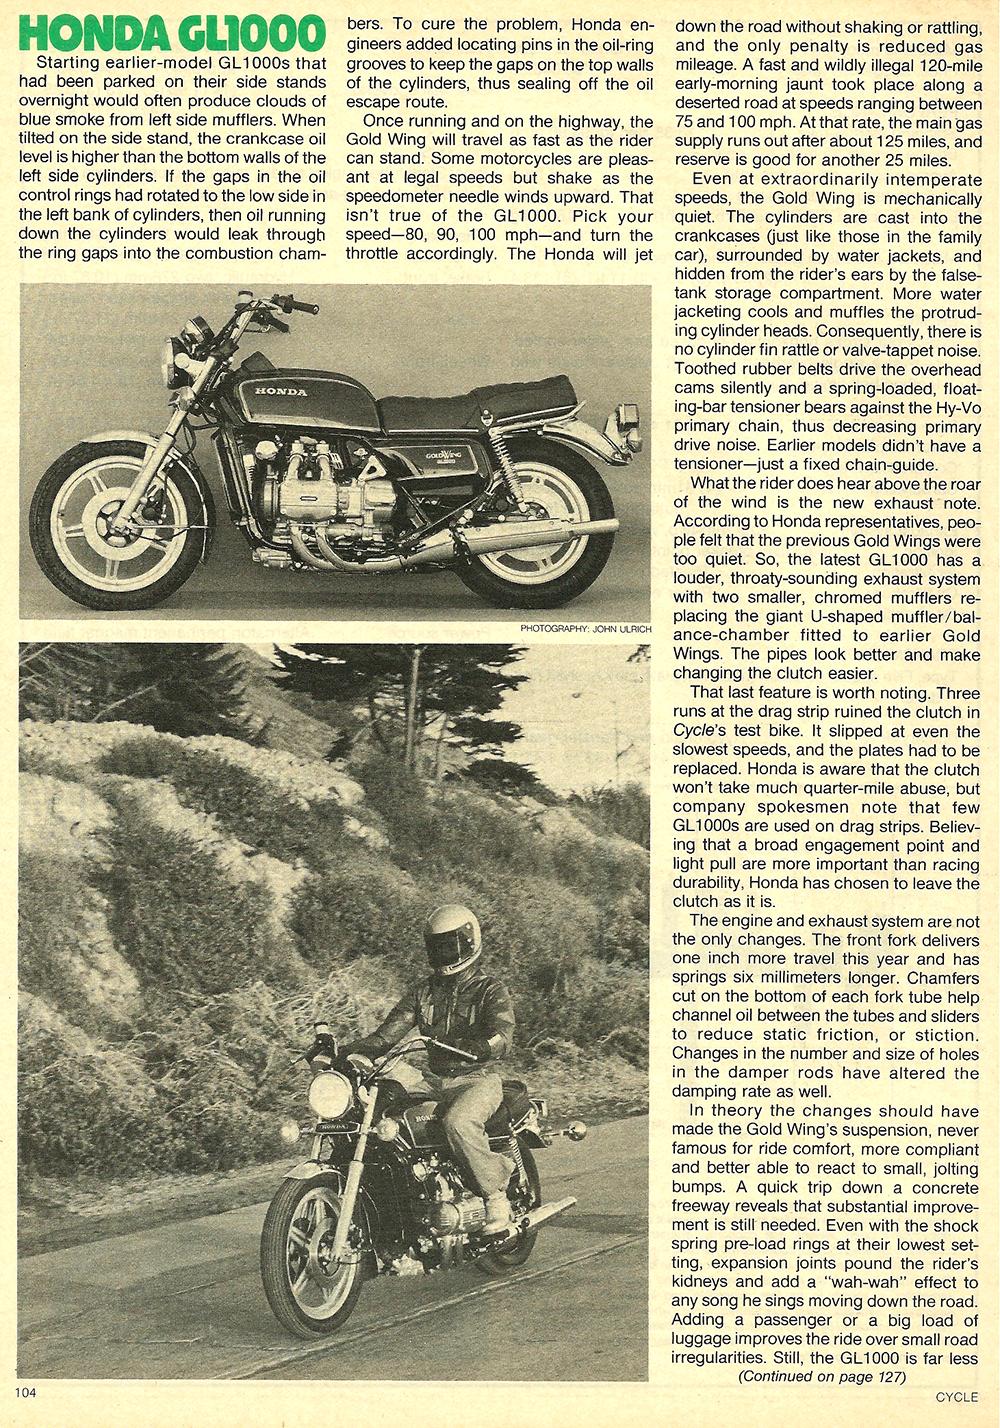 1978 Honda GL1000 road test 05.jpg